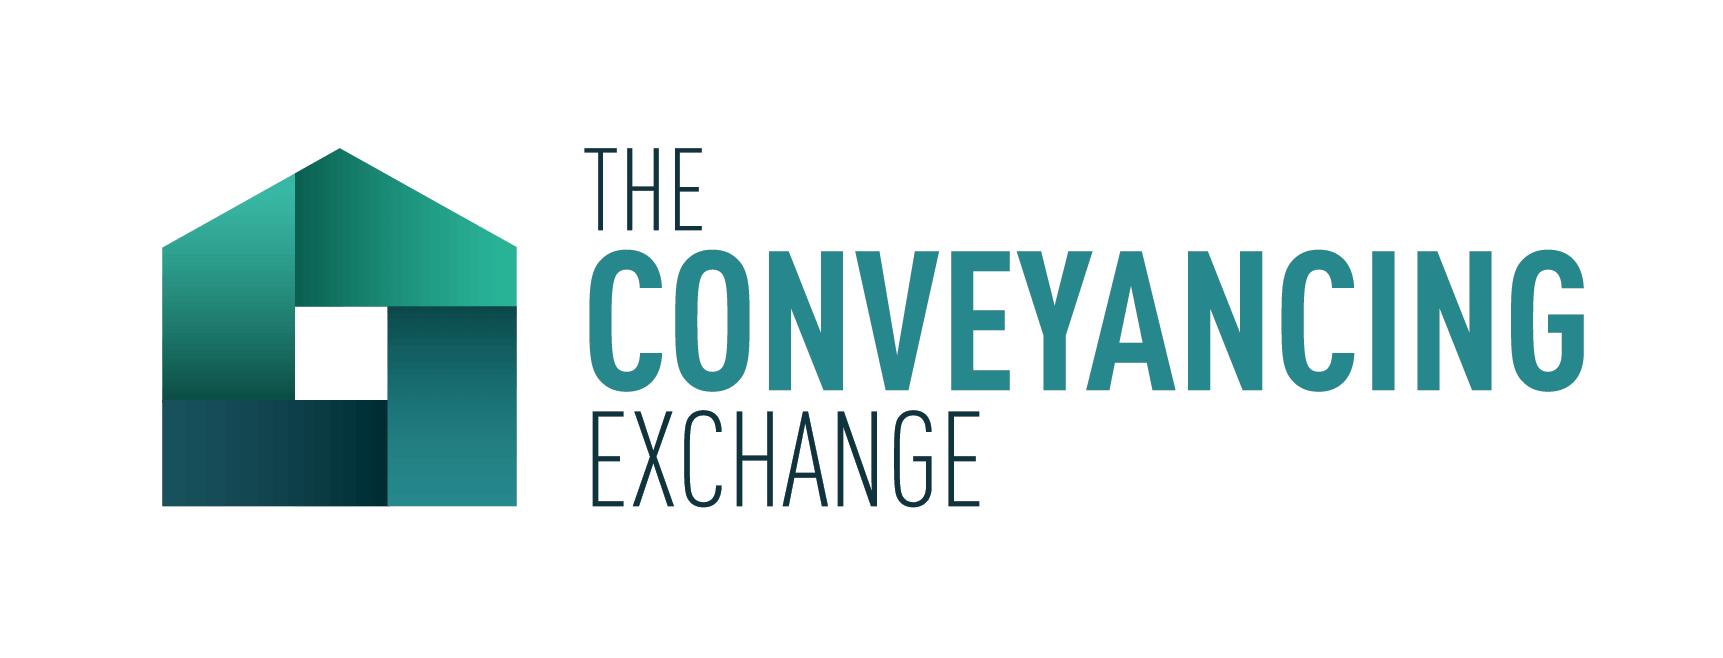 Conveyancing Exchange logo final-min.png